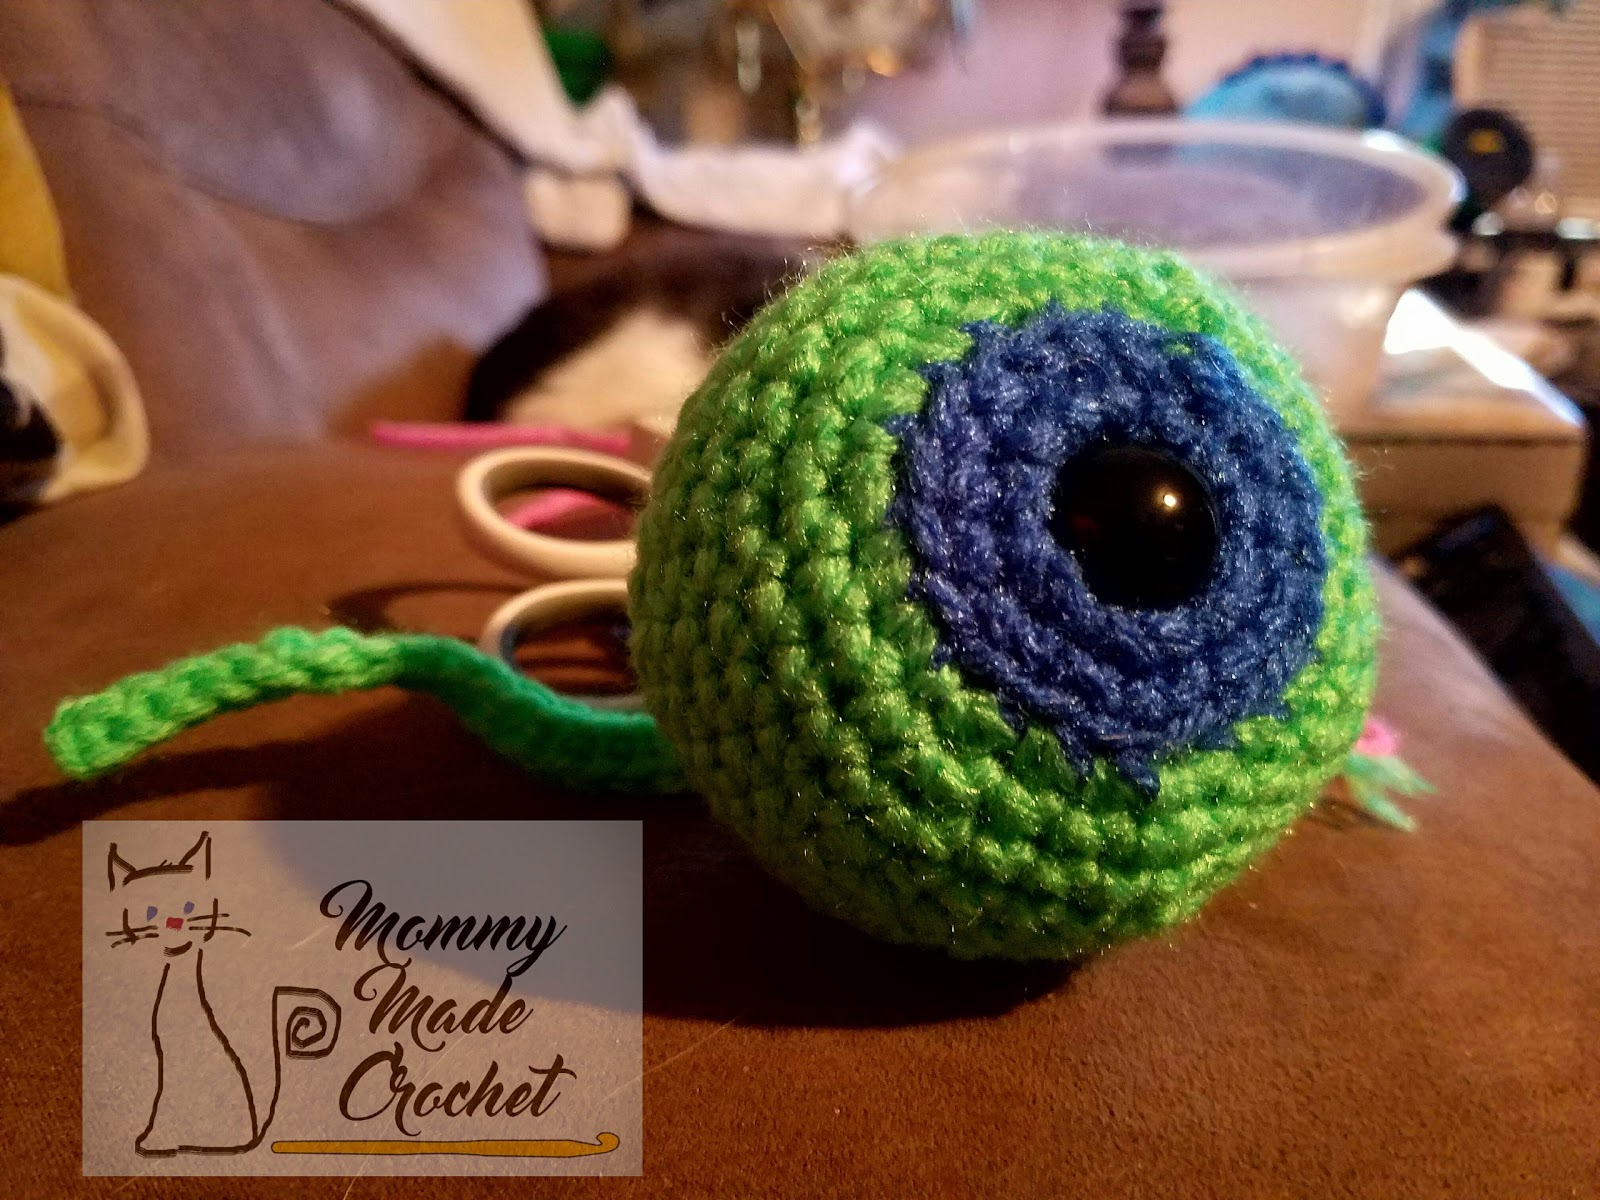 A Septic Eye mommy made crochet: septic eye sam - free crochet pattern